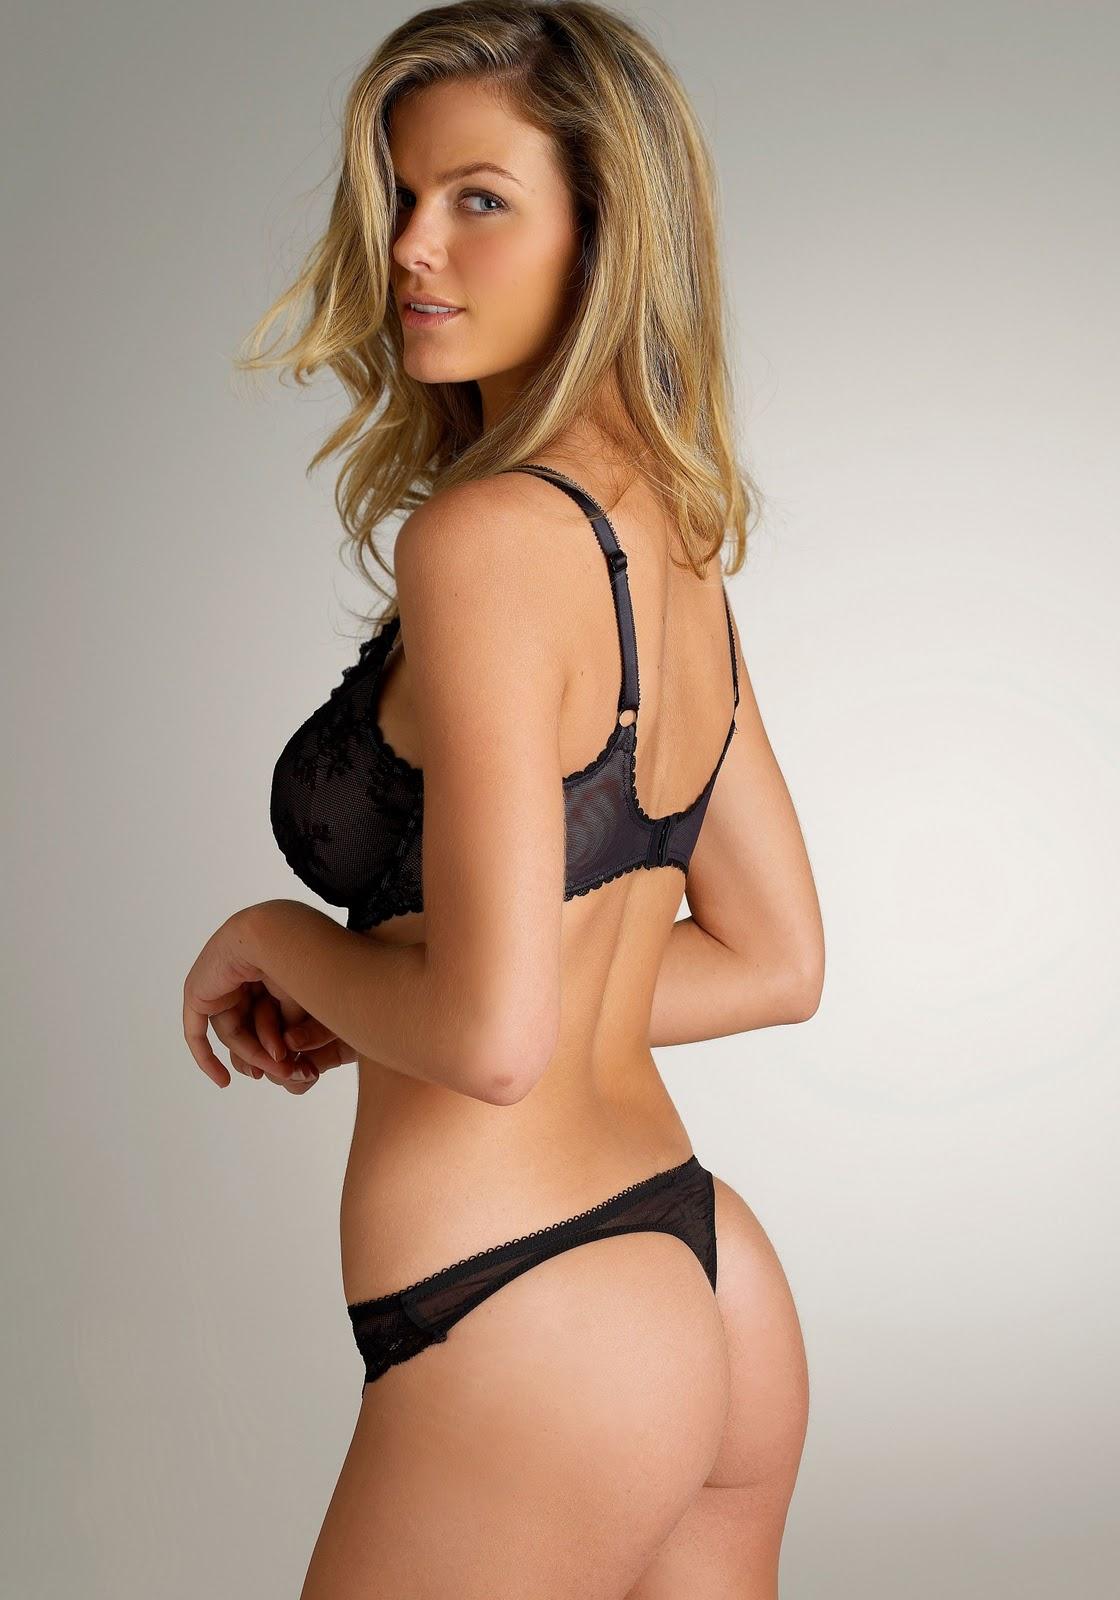 John Galliano Bikini   6k pics